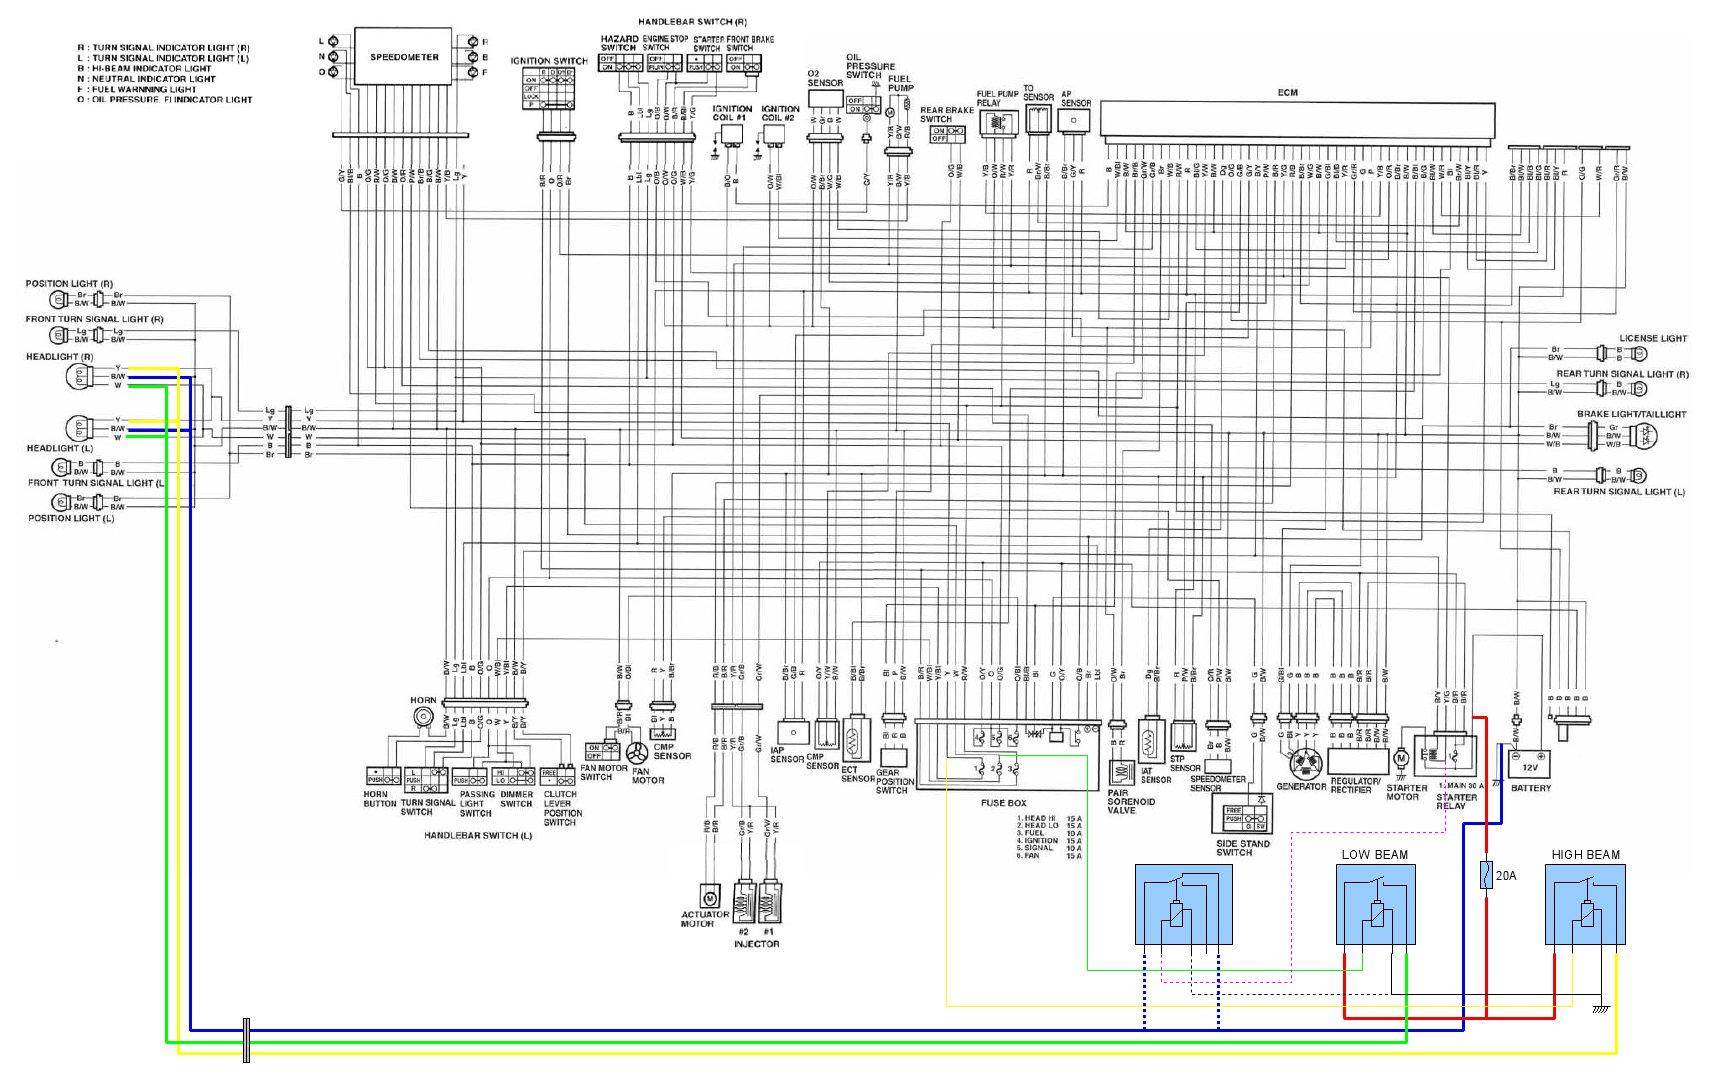 Headlight rewiring with relays | SV PortalSV1000 Portal